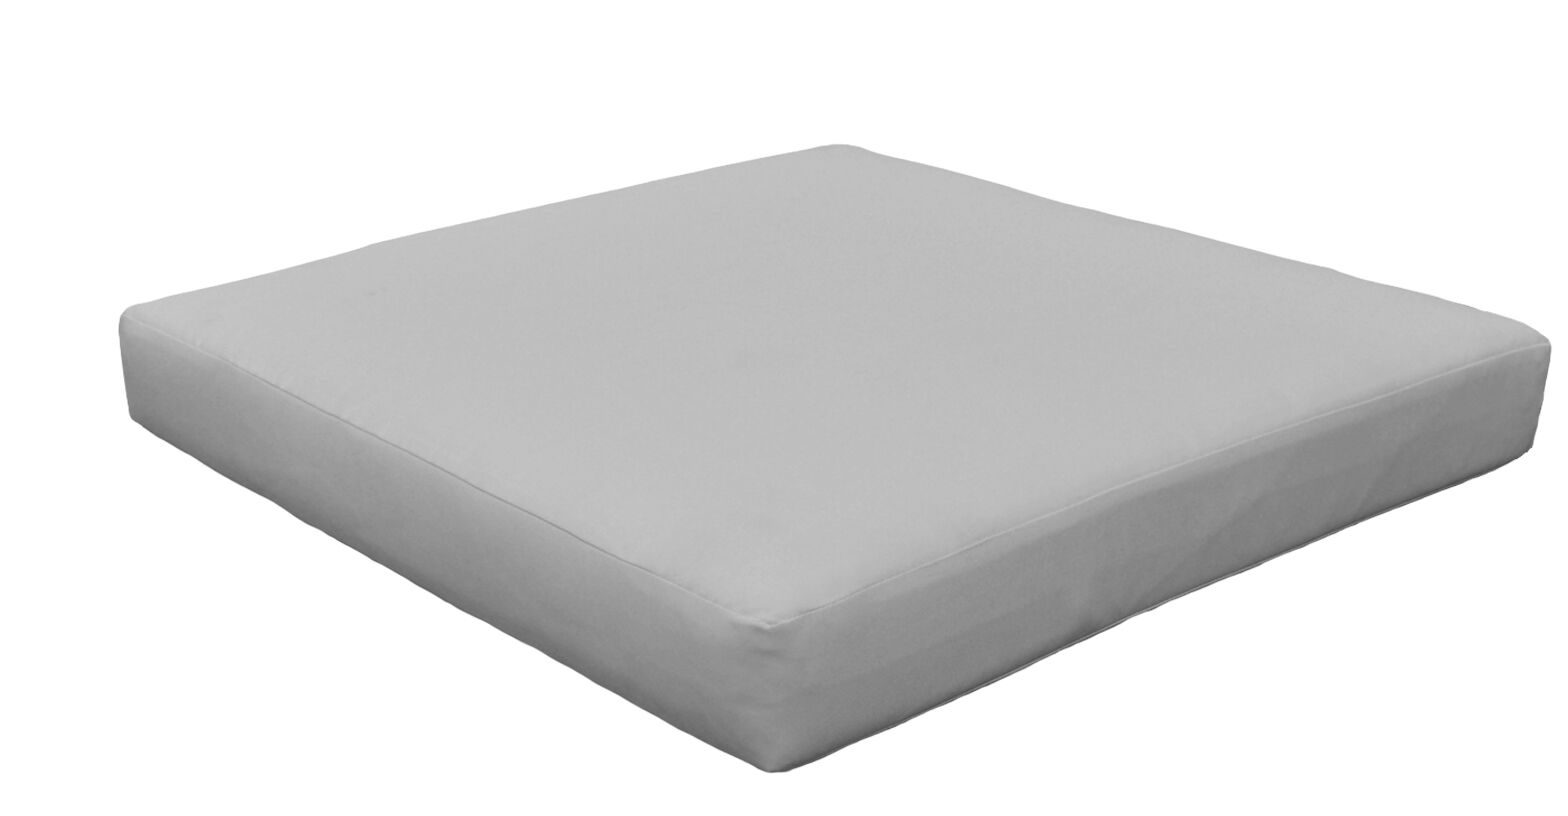 Outdoor Ottoman Cushion Size: 6